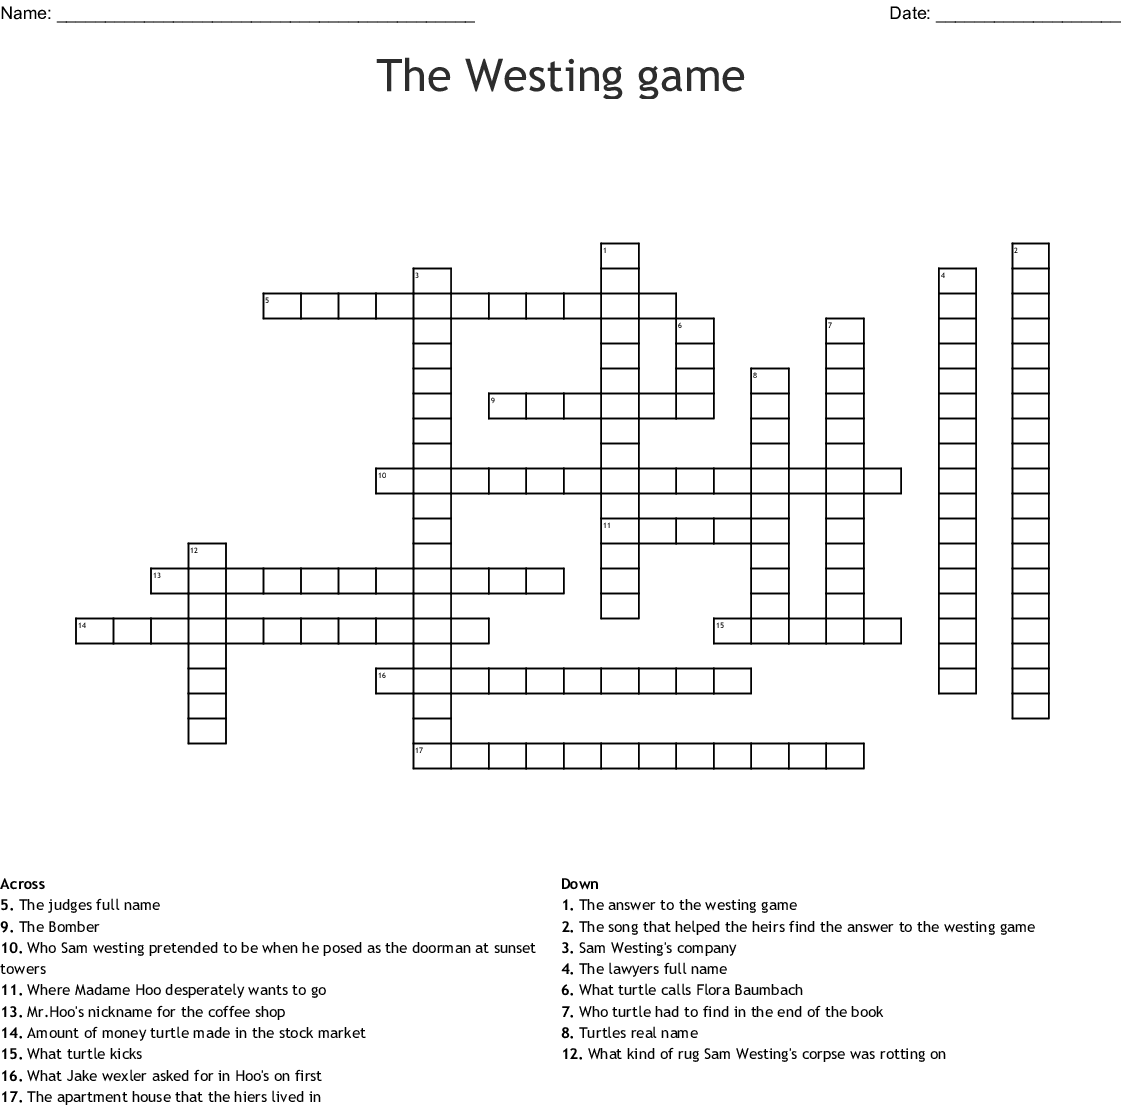 The Westing game Crossword - WordMint